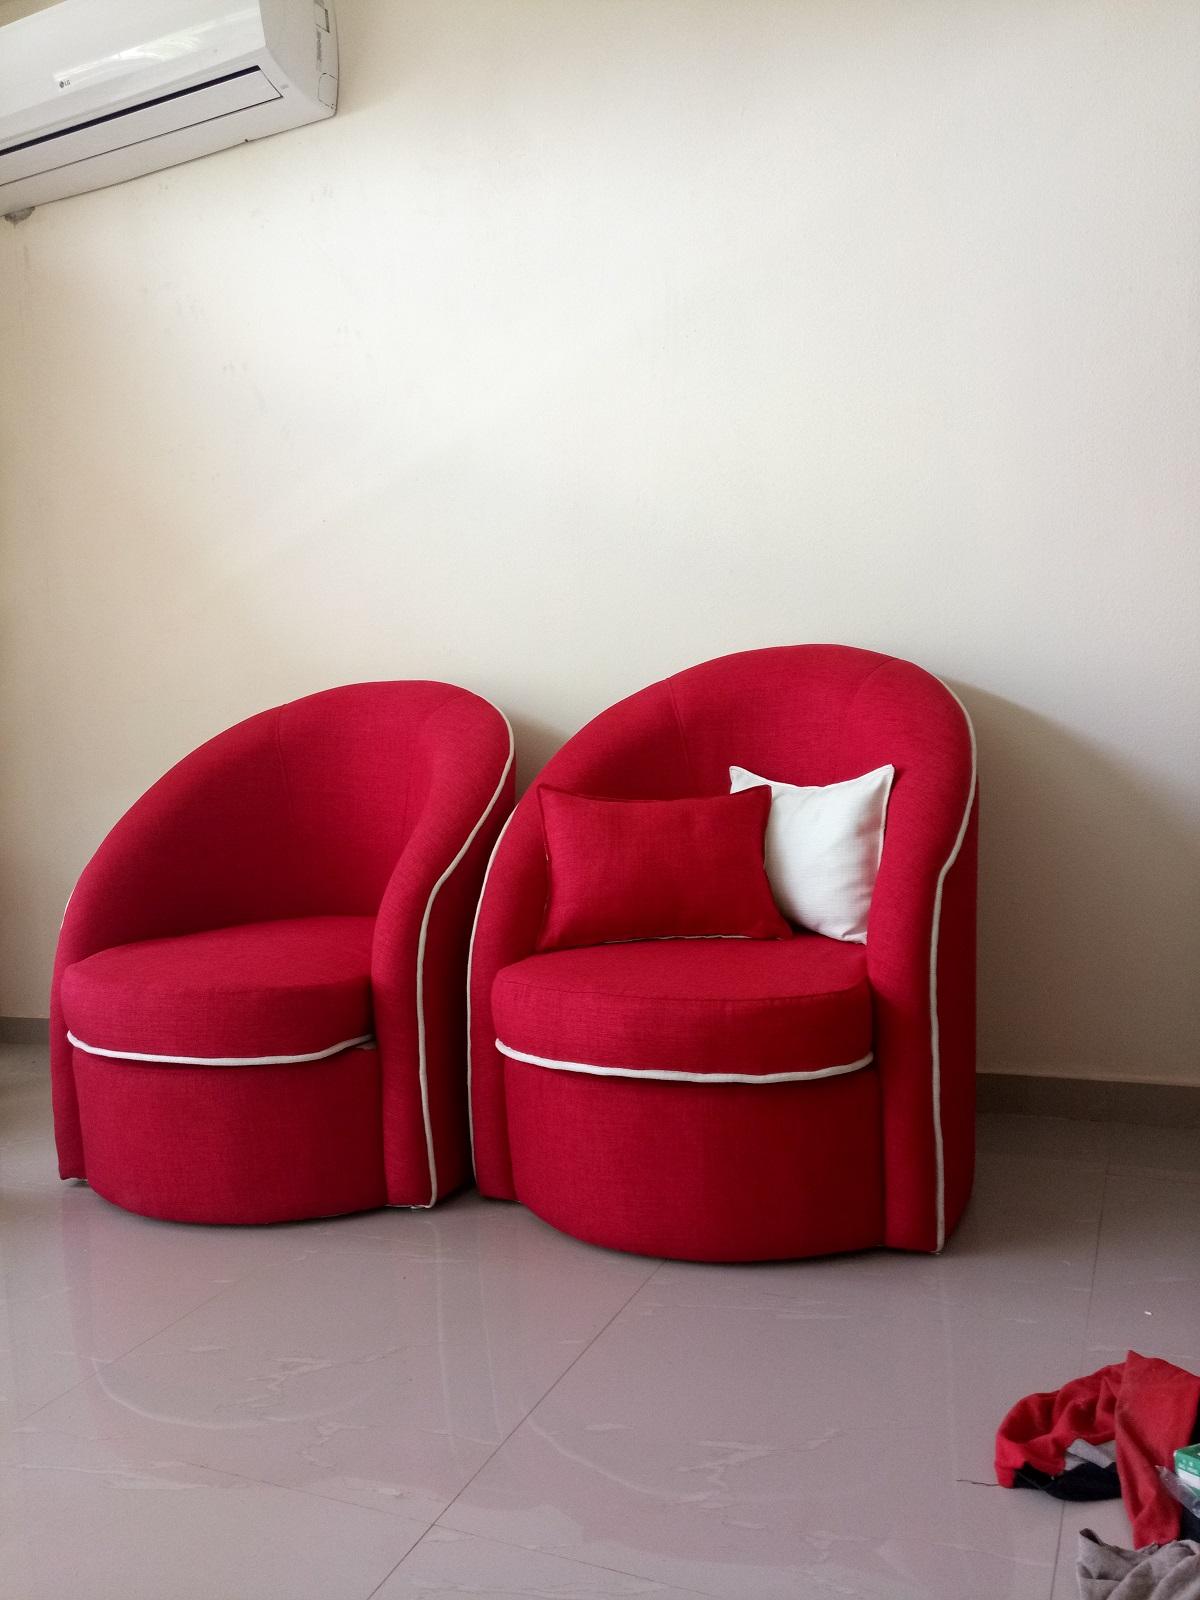 Comfy Waiting Seats